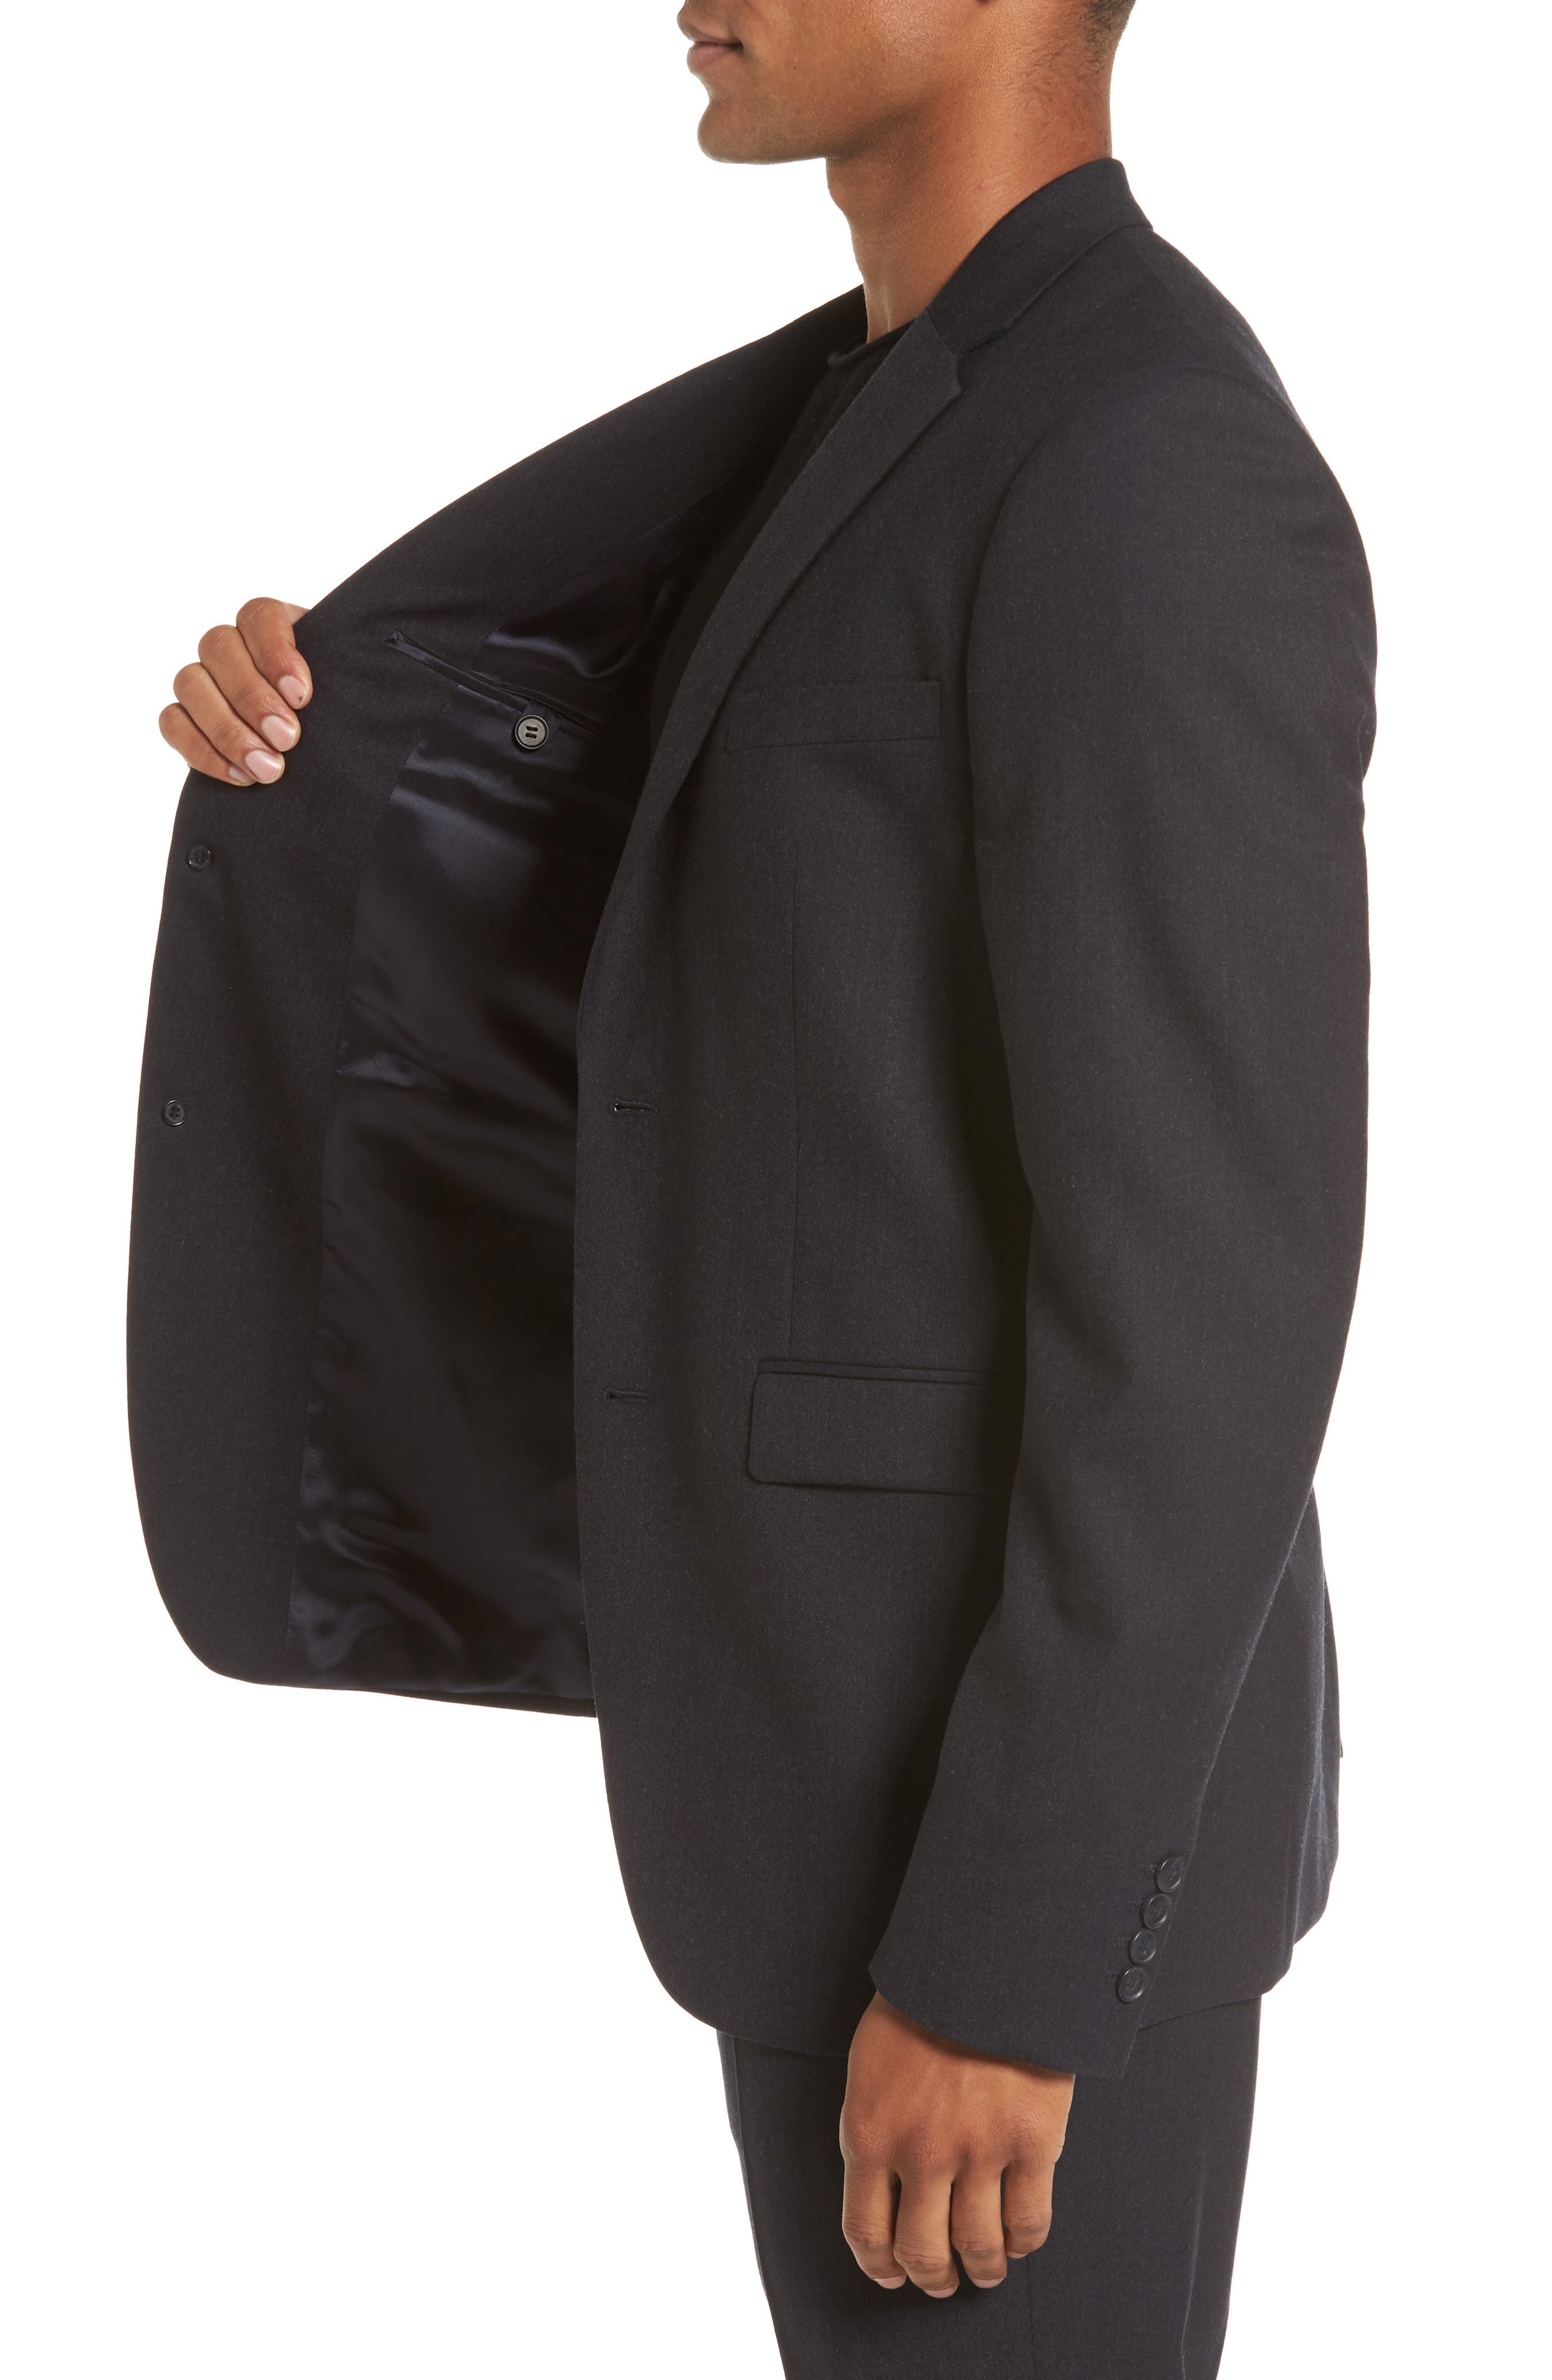 Regular Fit Blazer,                             Alternate thumbnail 3, color,                             Charcoal